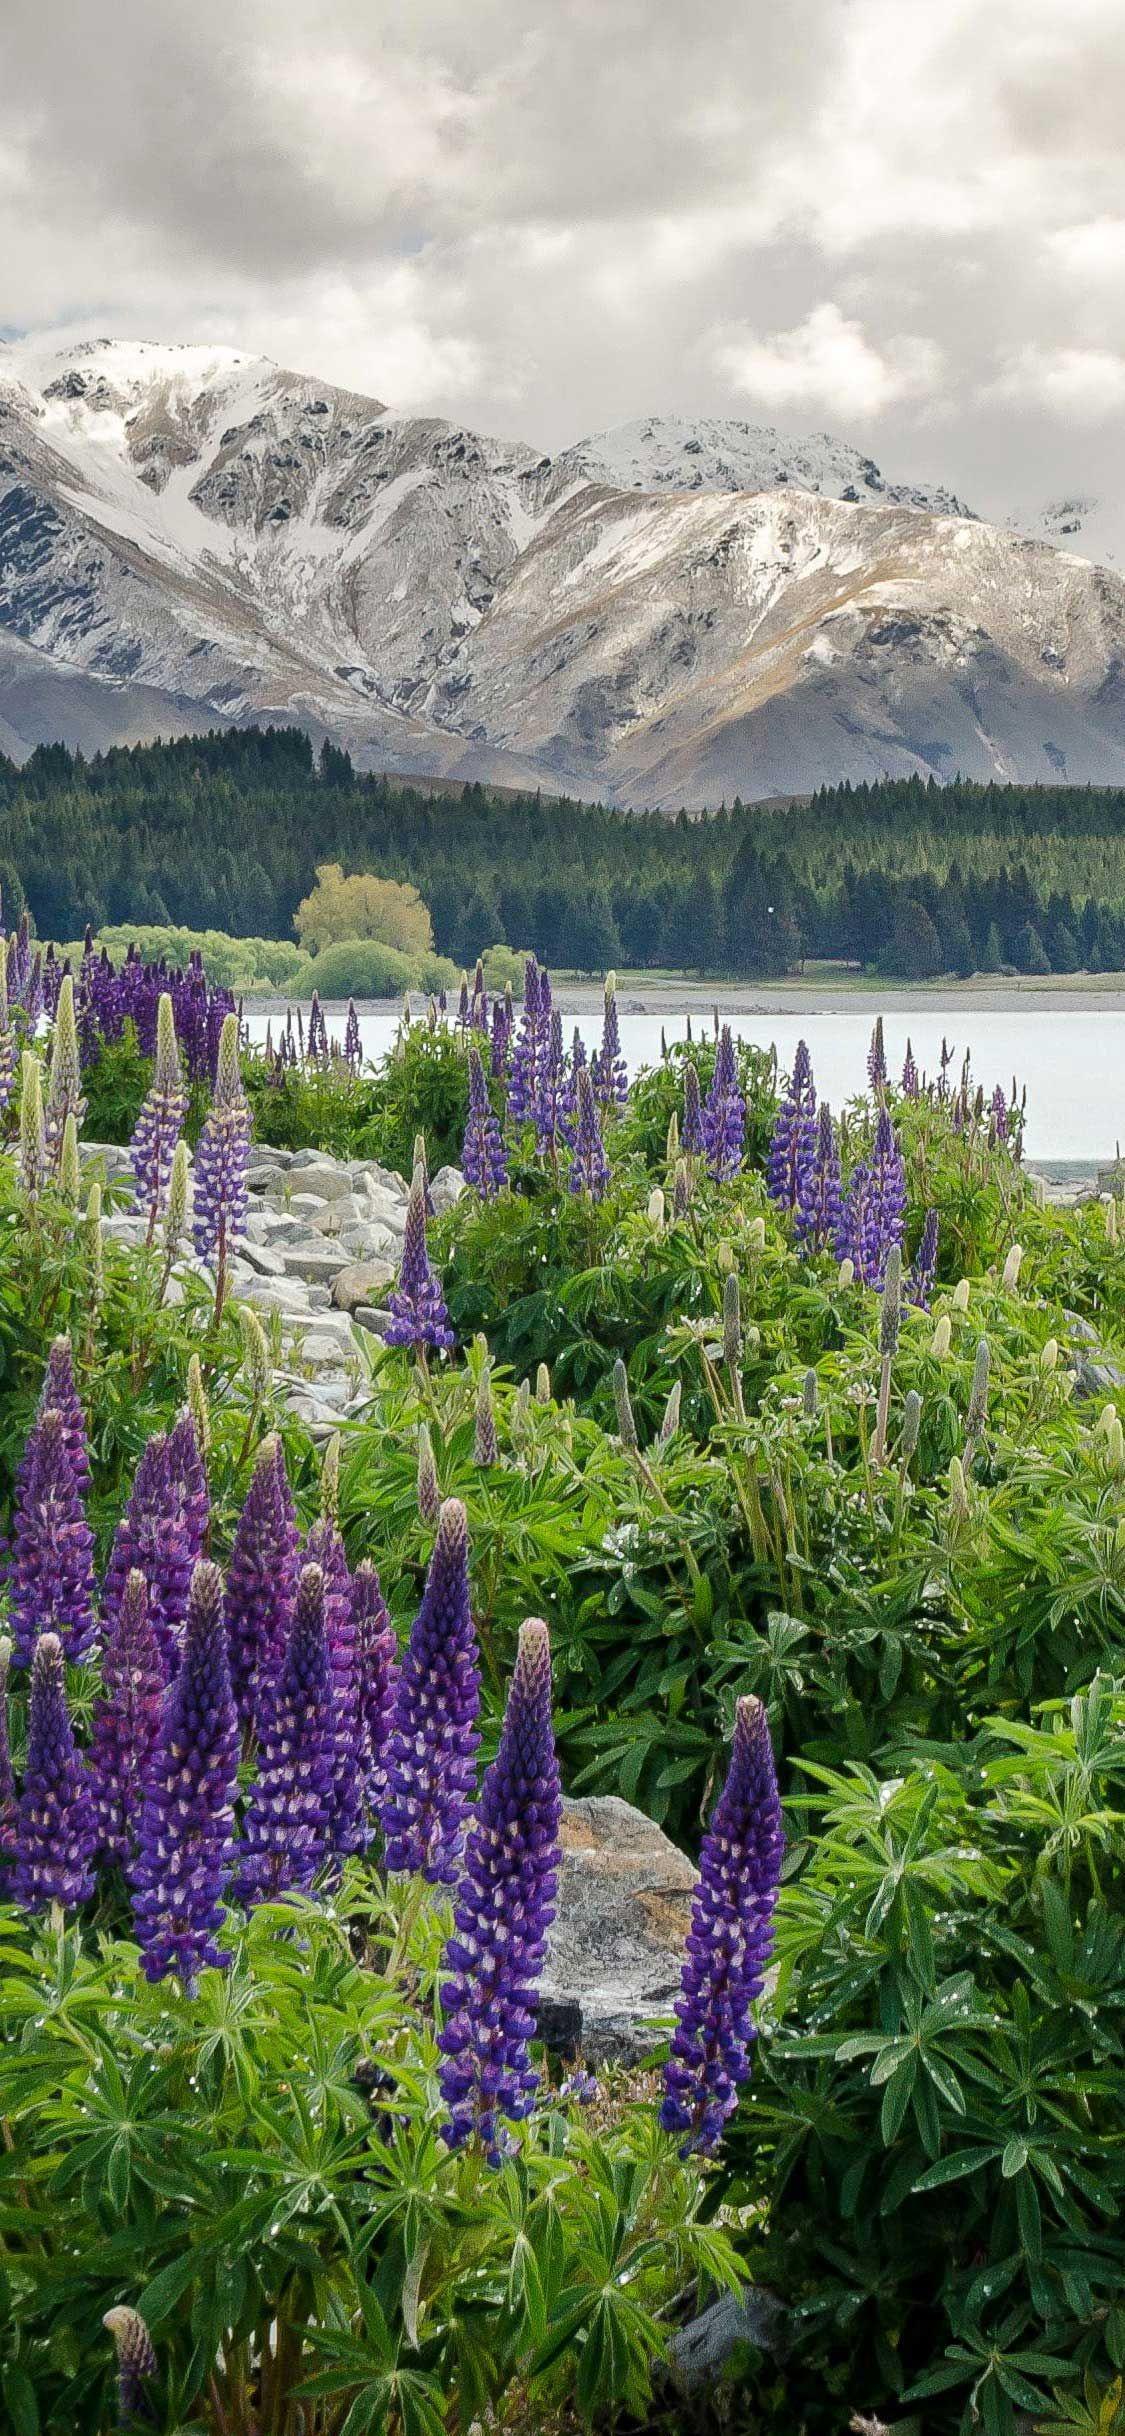 Iphone Pro Wallpaper New zealand mountains flowers lake